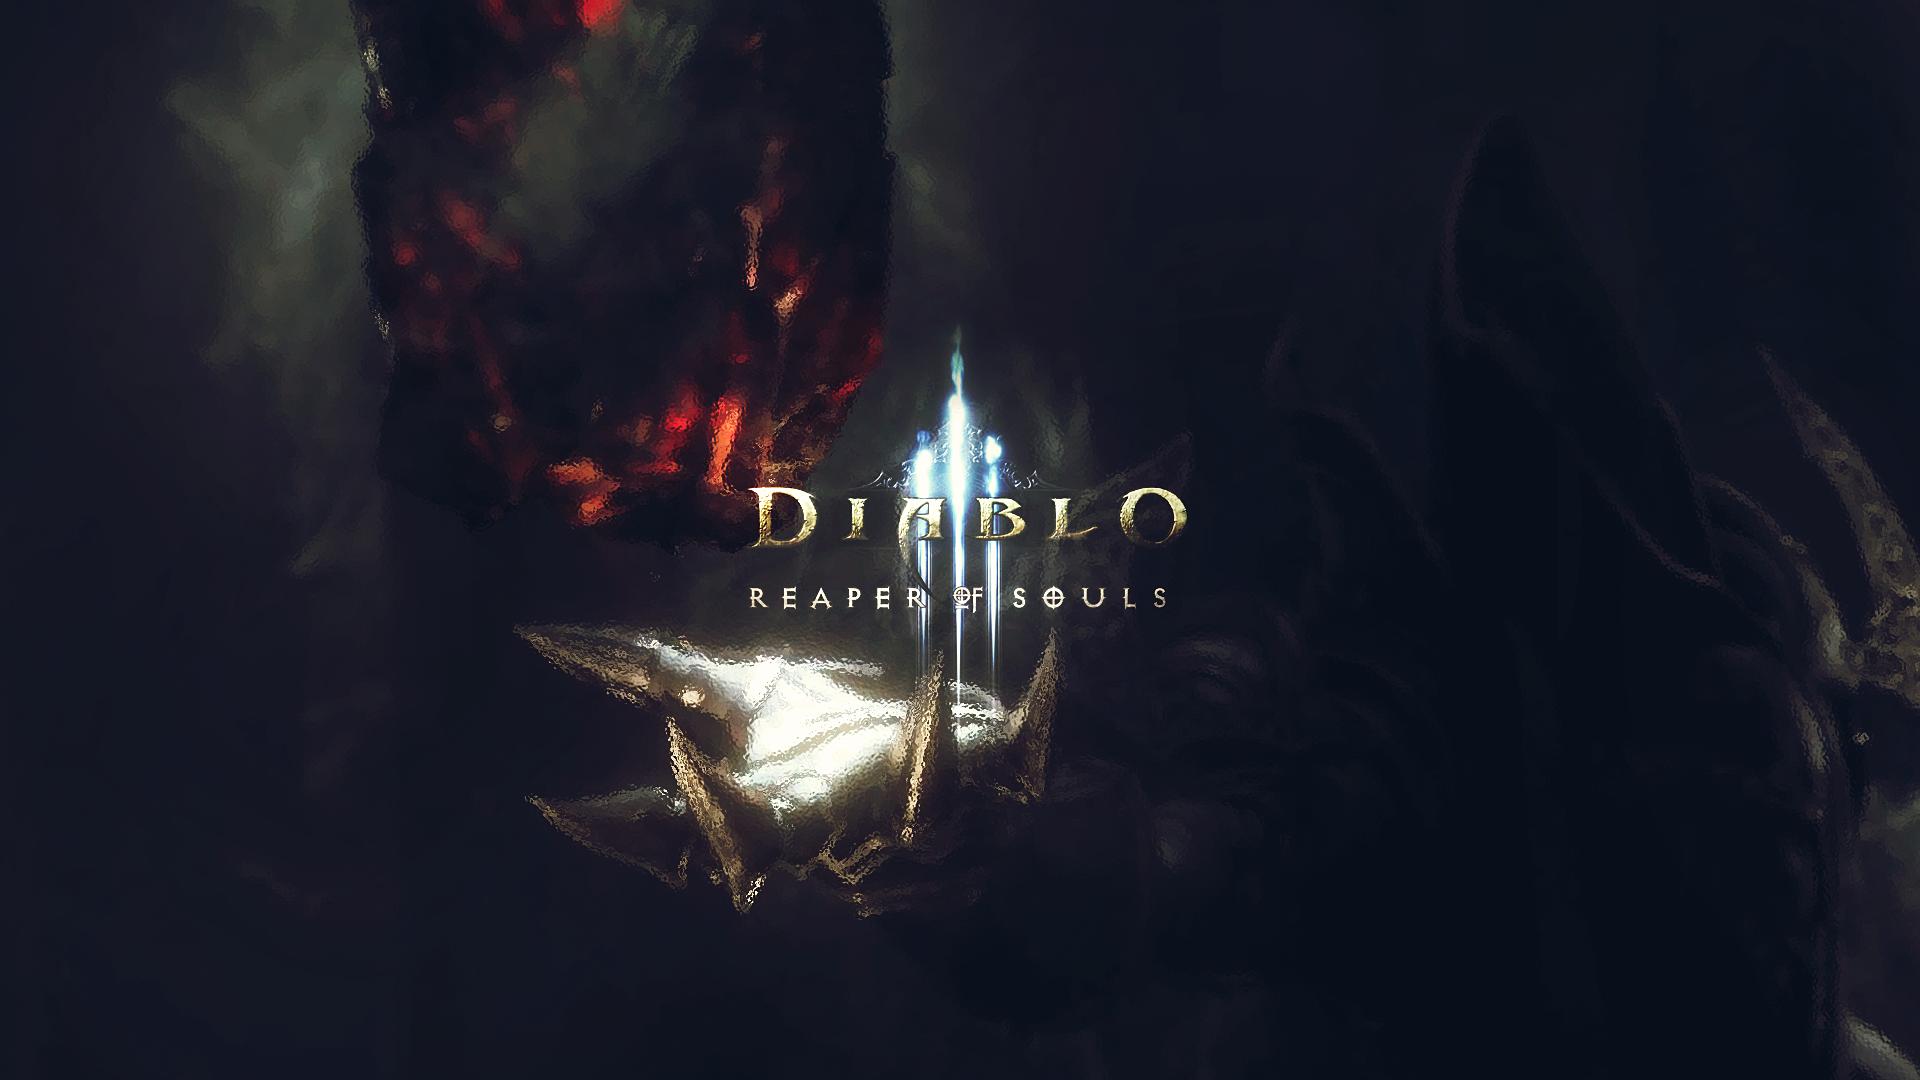 Diablo Iii Reaper Of Souls Backgrounds Pictures Images